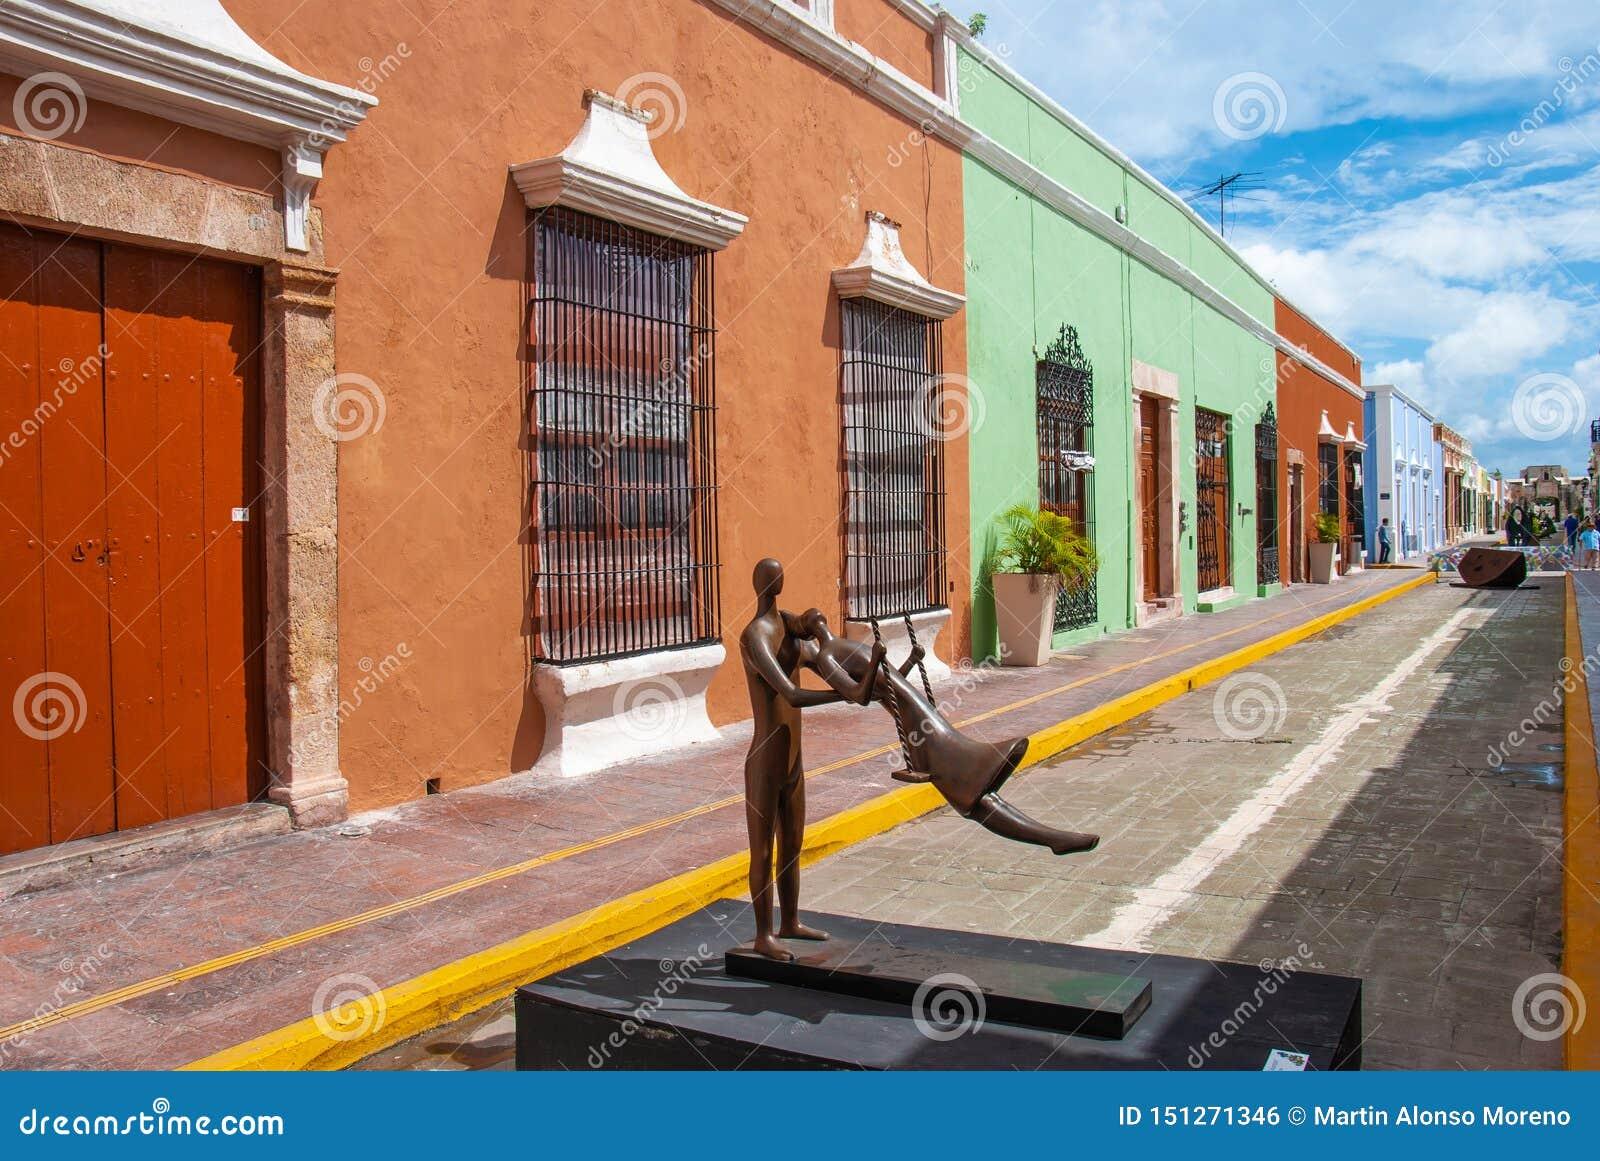 Aleia do centro histórico de Campeche México